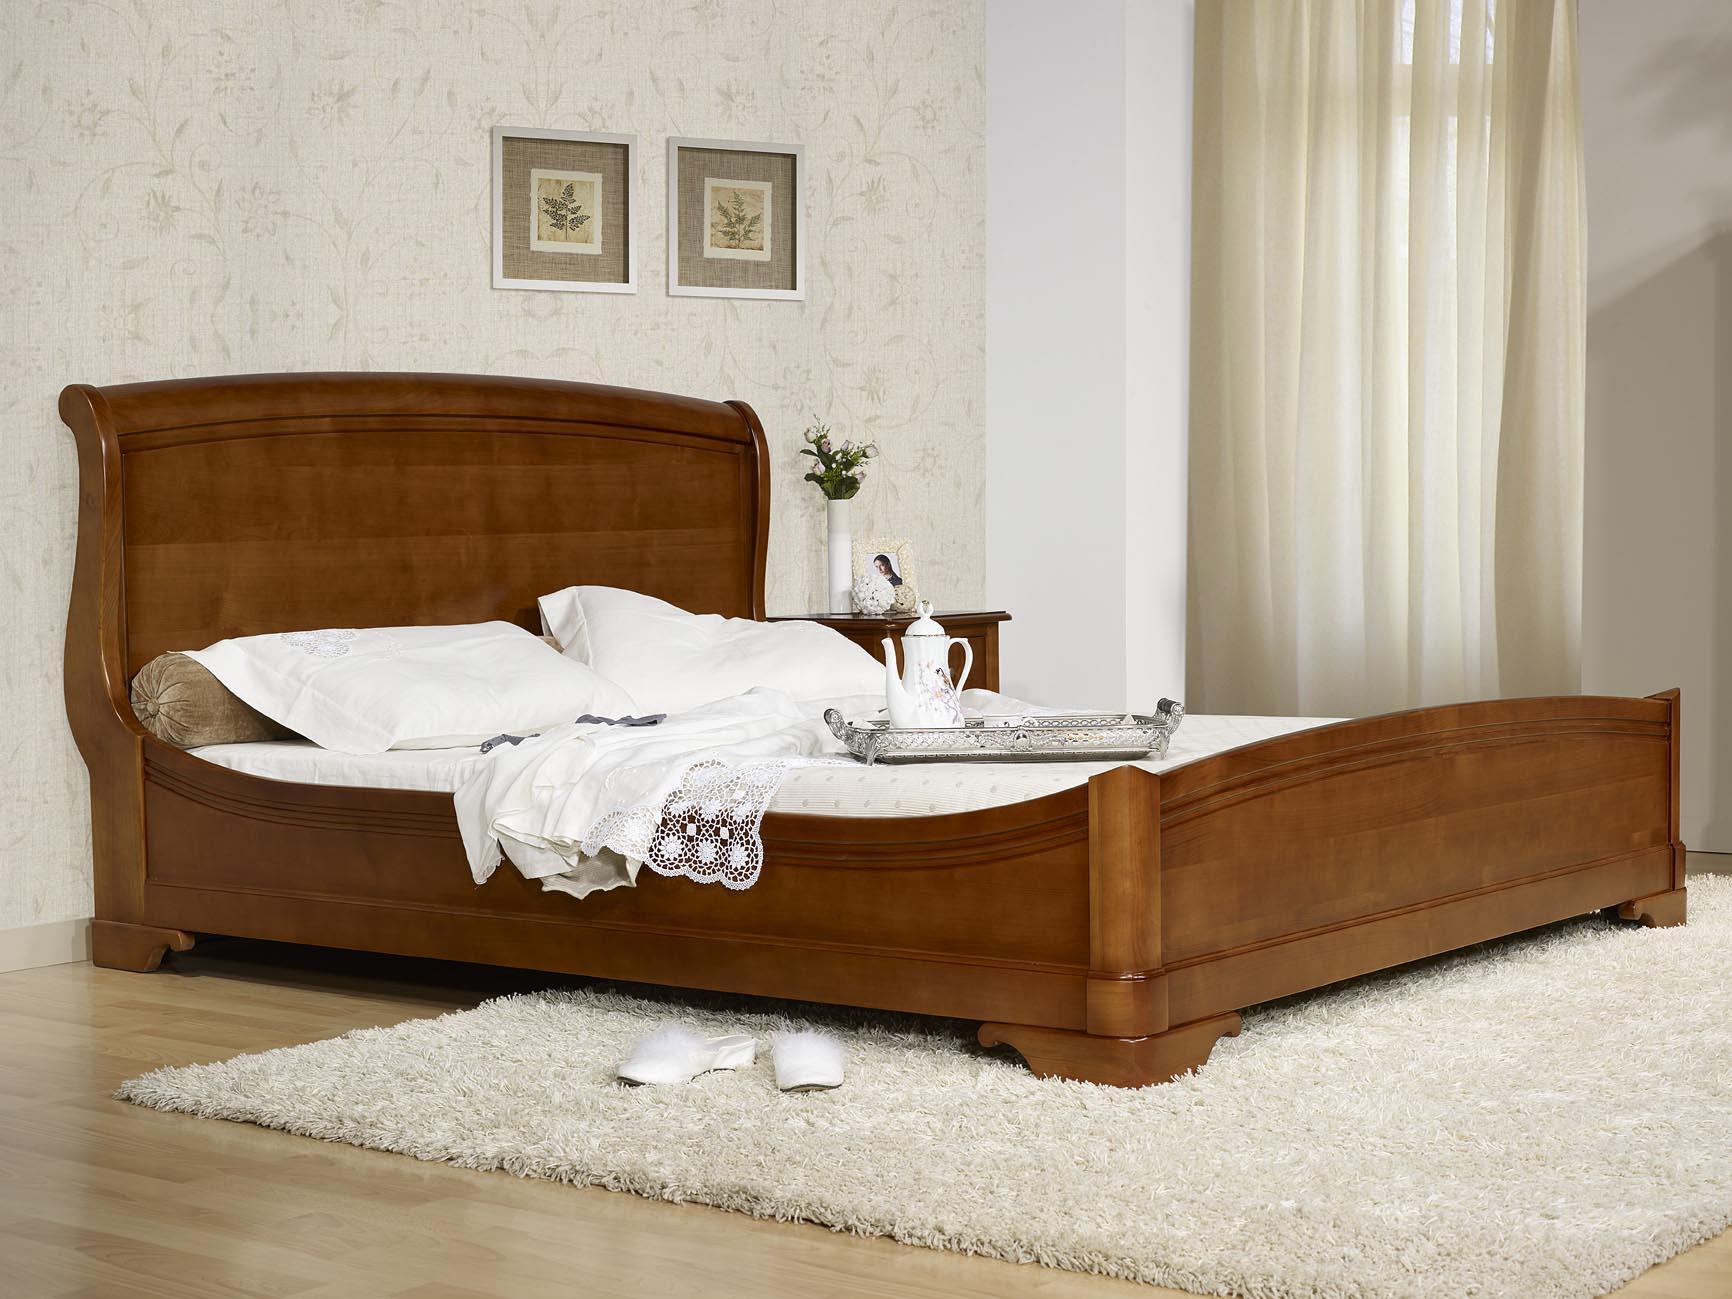 lit 180x200 en merisier massif de style louis philippe meuble en merisier. Black Bedroom Furniture Sets. Home Design Ideas